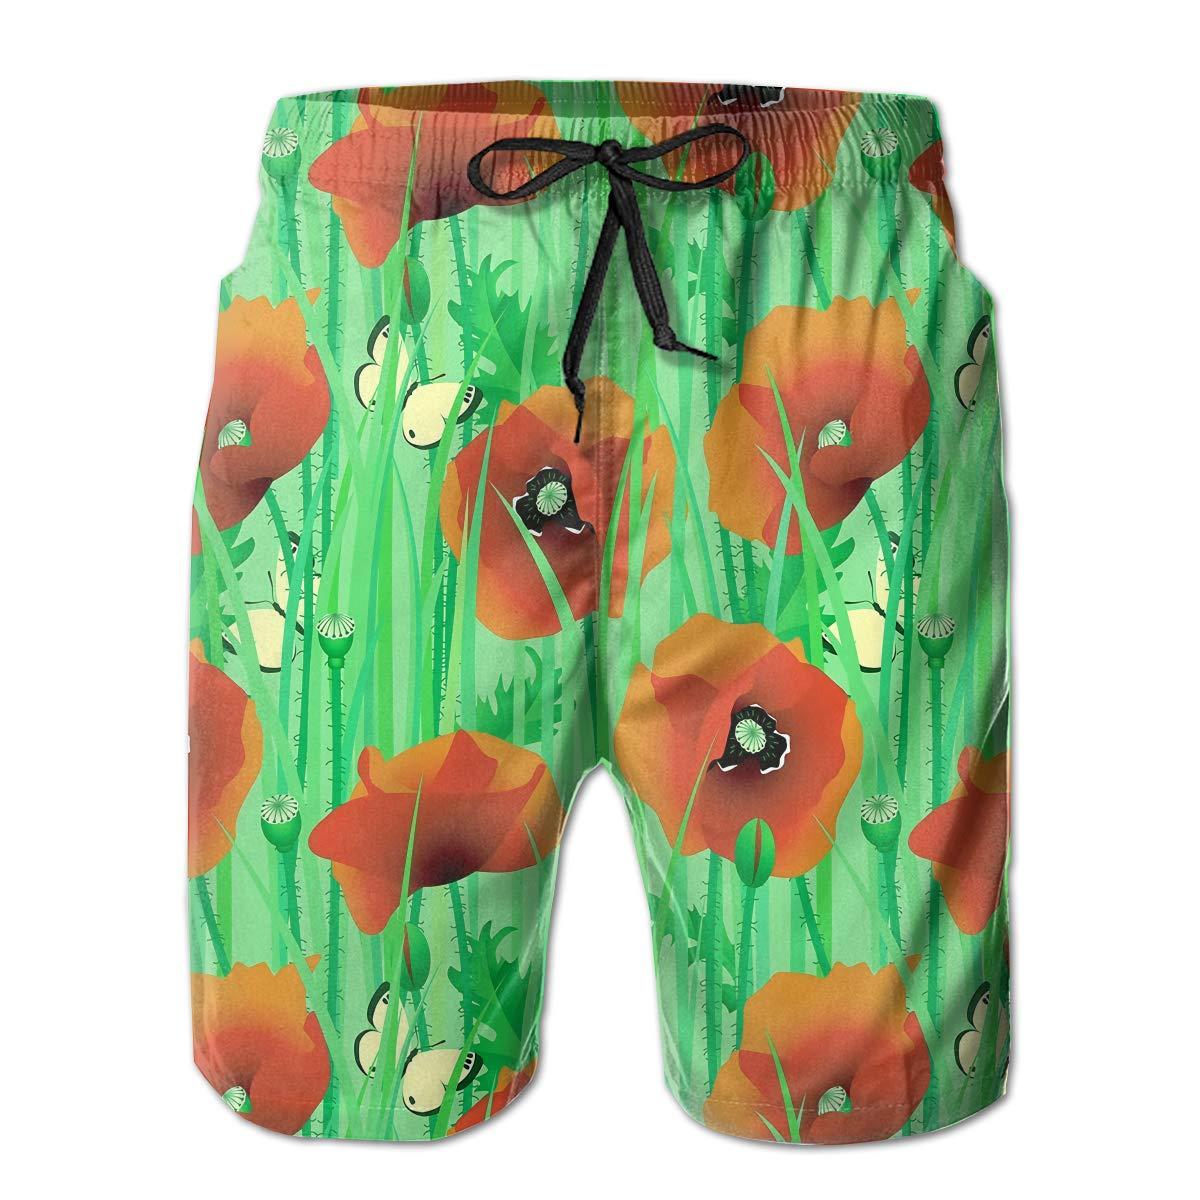 Mens Comfortable Hawaii Beach Rowing Funny Beach Shorts Swim Trunks Board Shorts